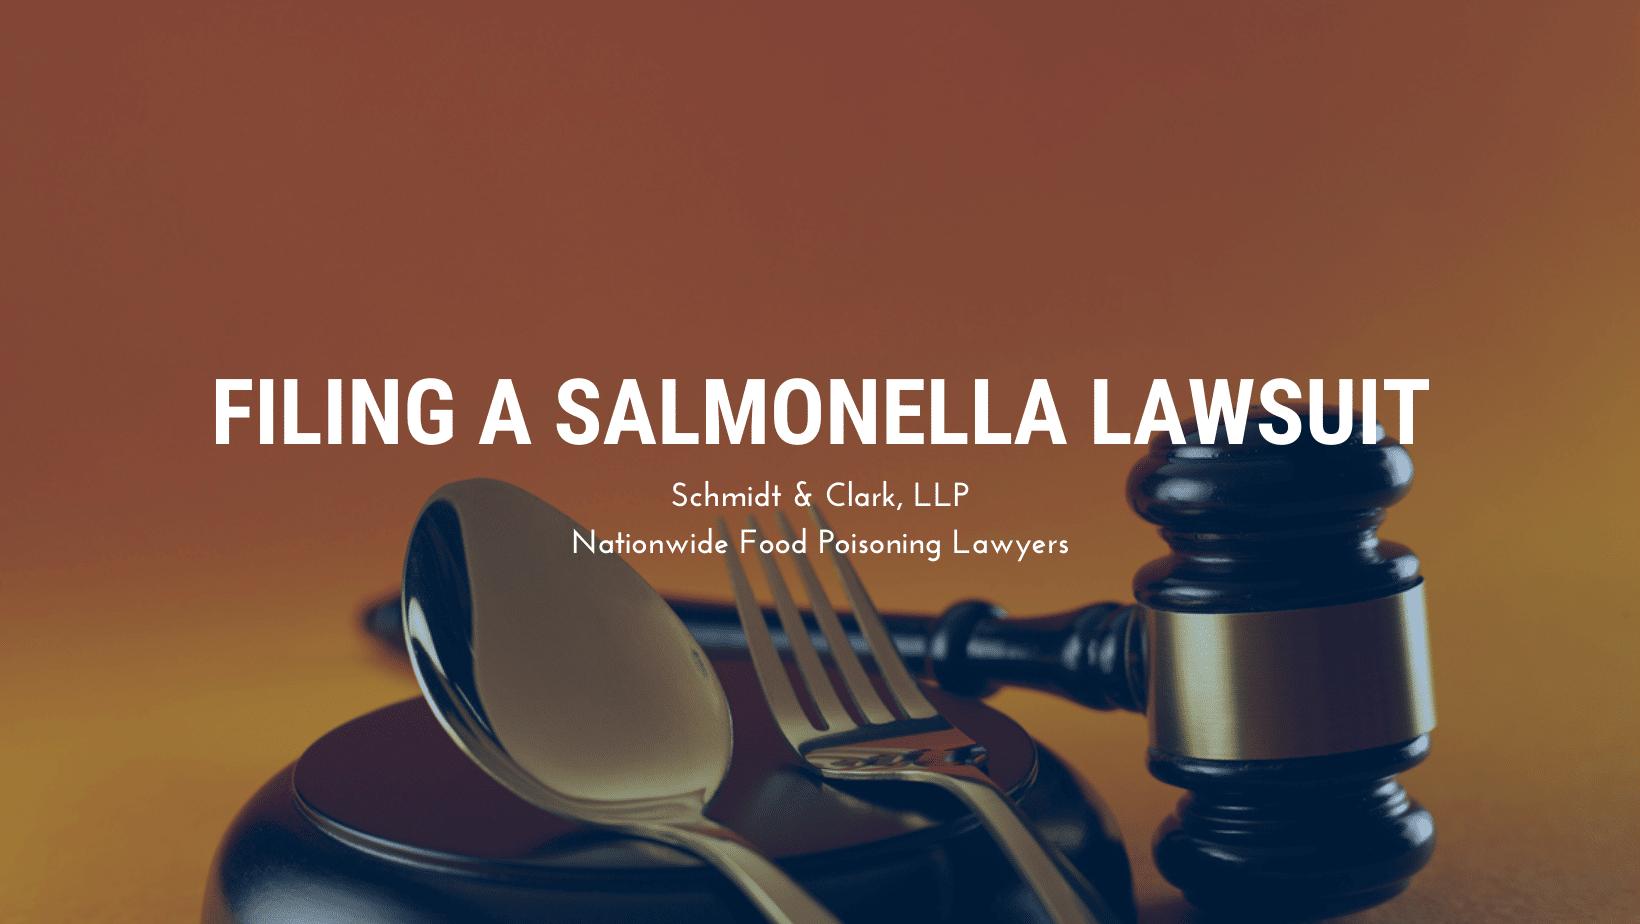 Filing a Salmonella Lawsuit